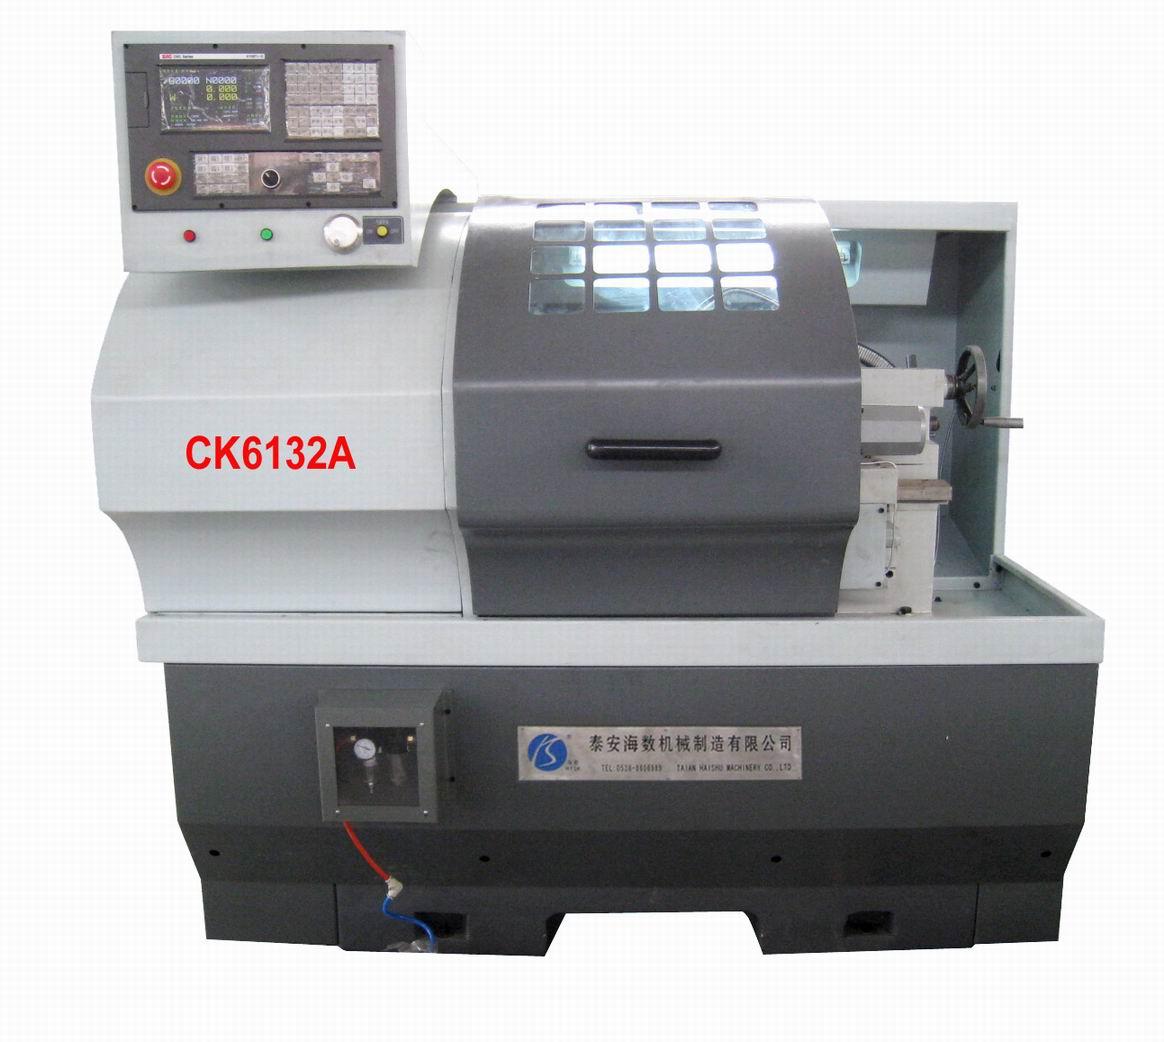 ck6132a 数控车床_taian haishu machinery co.,ltd